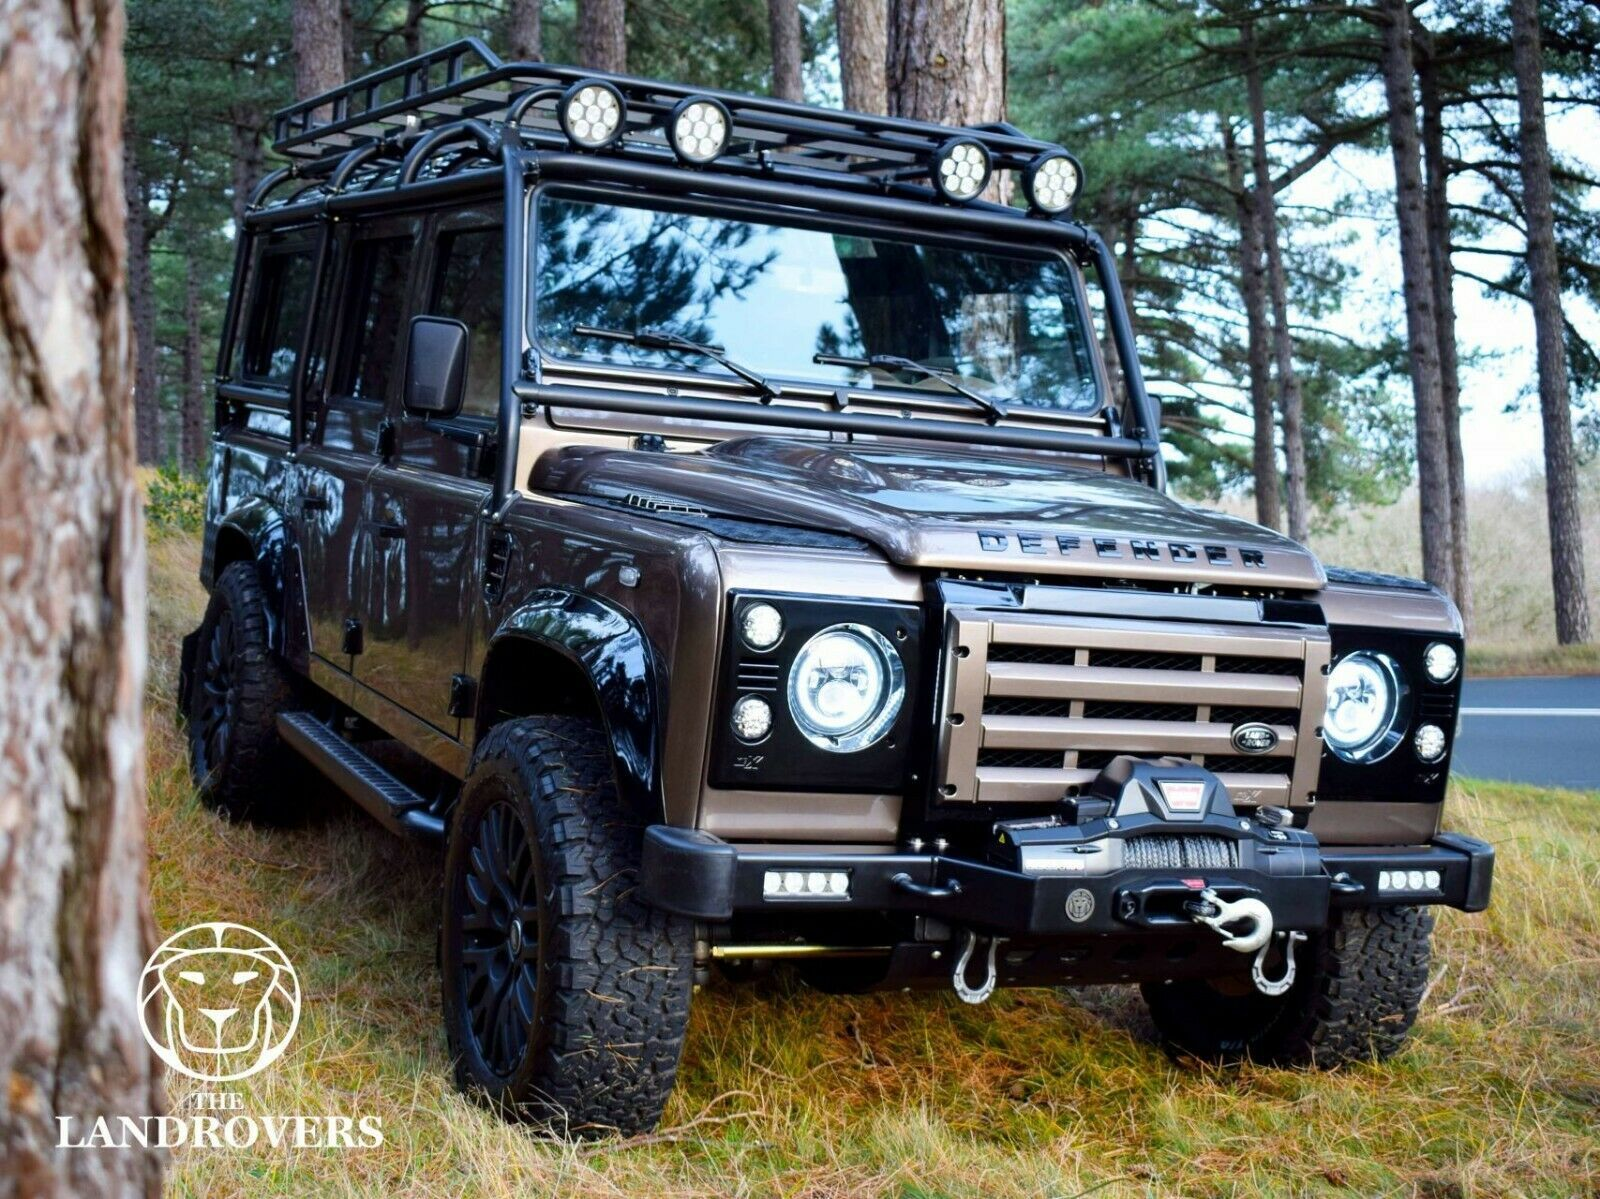 Land Rover Defender Land Rover Defender Land Rover Land Rover Defender 110